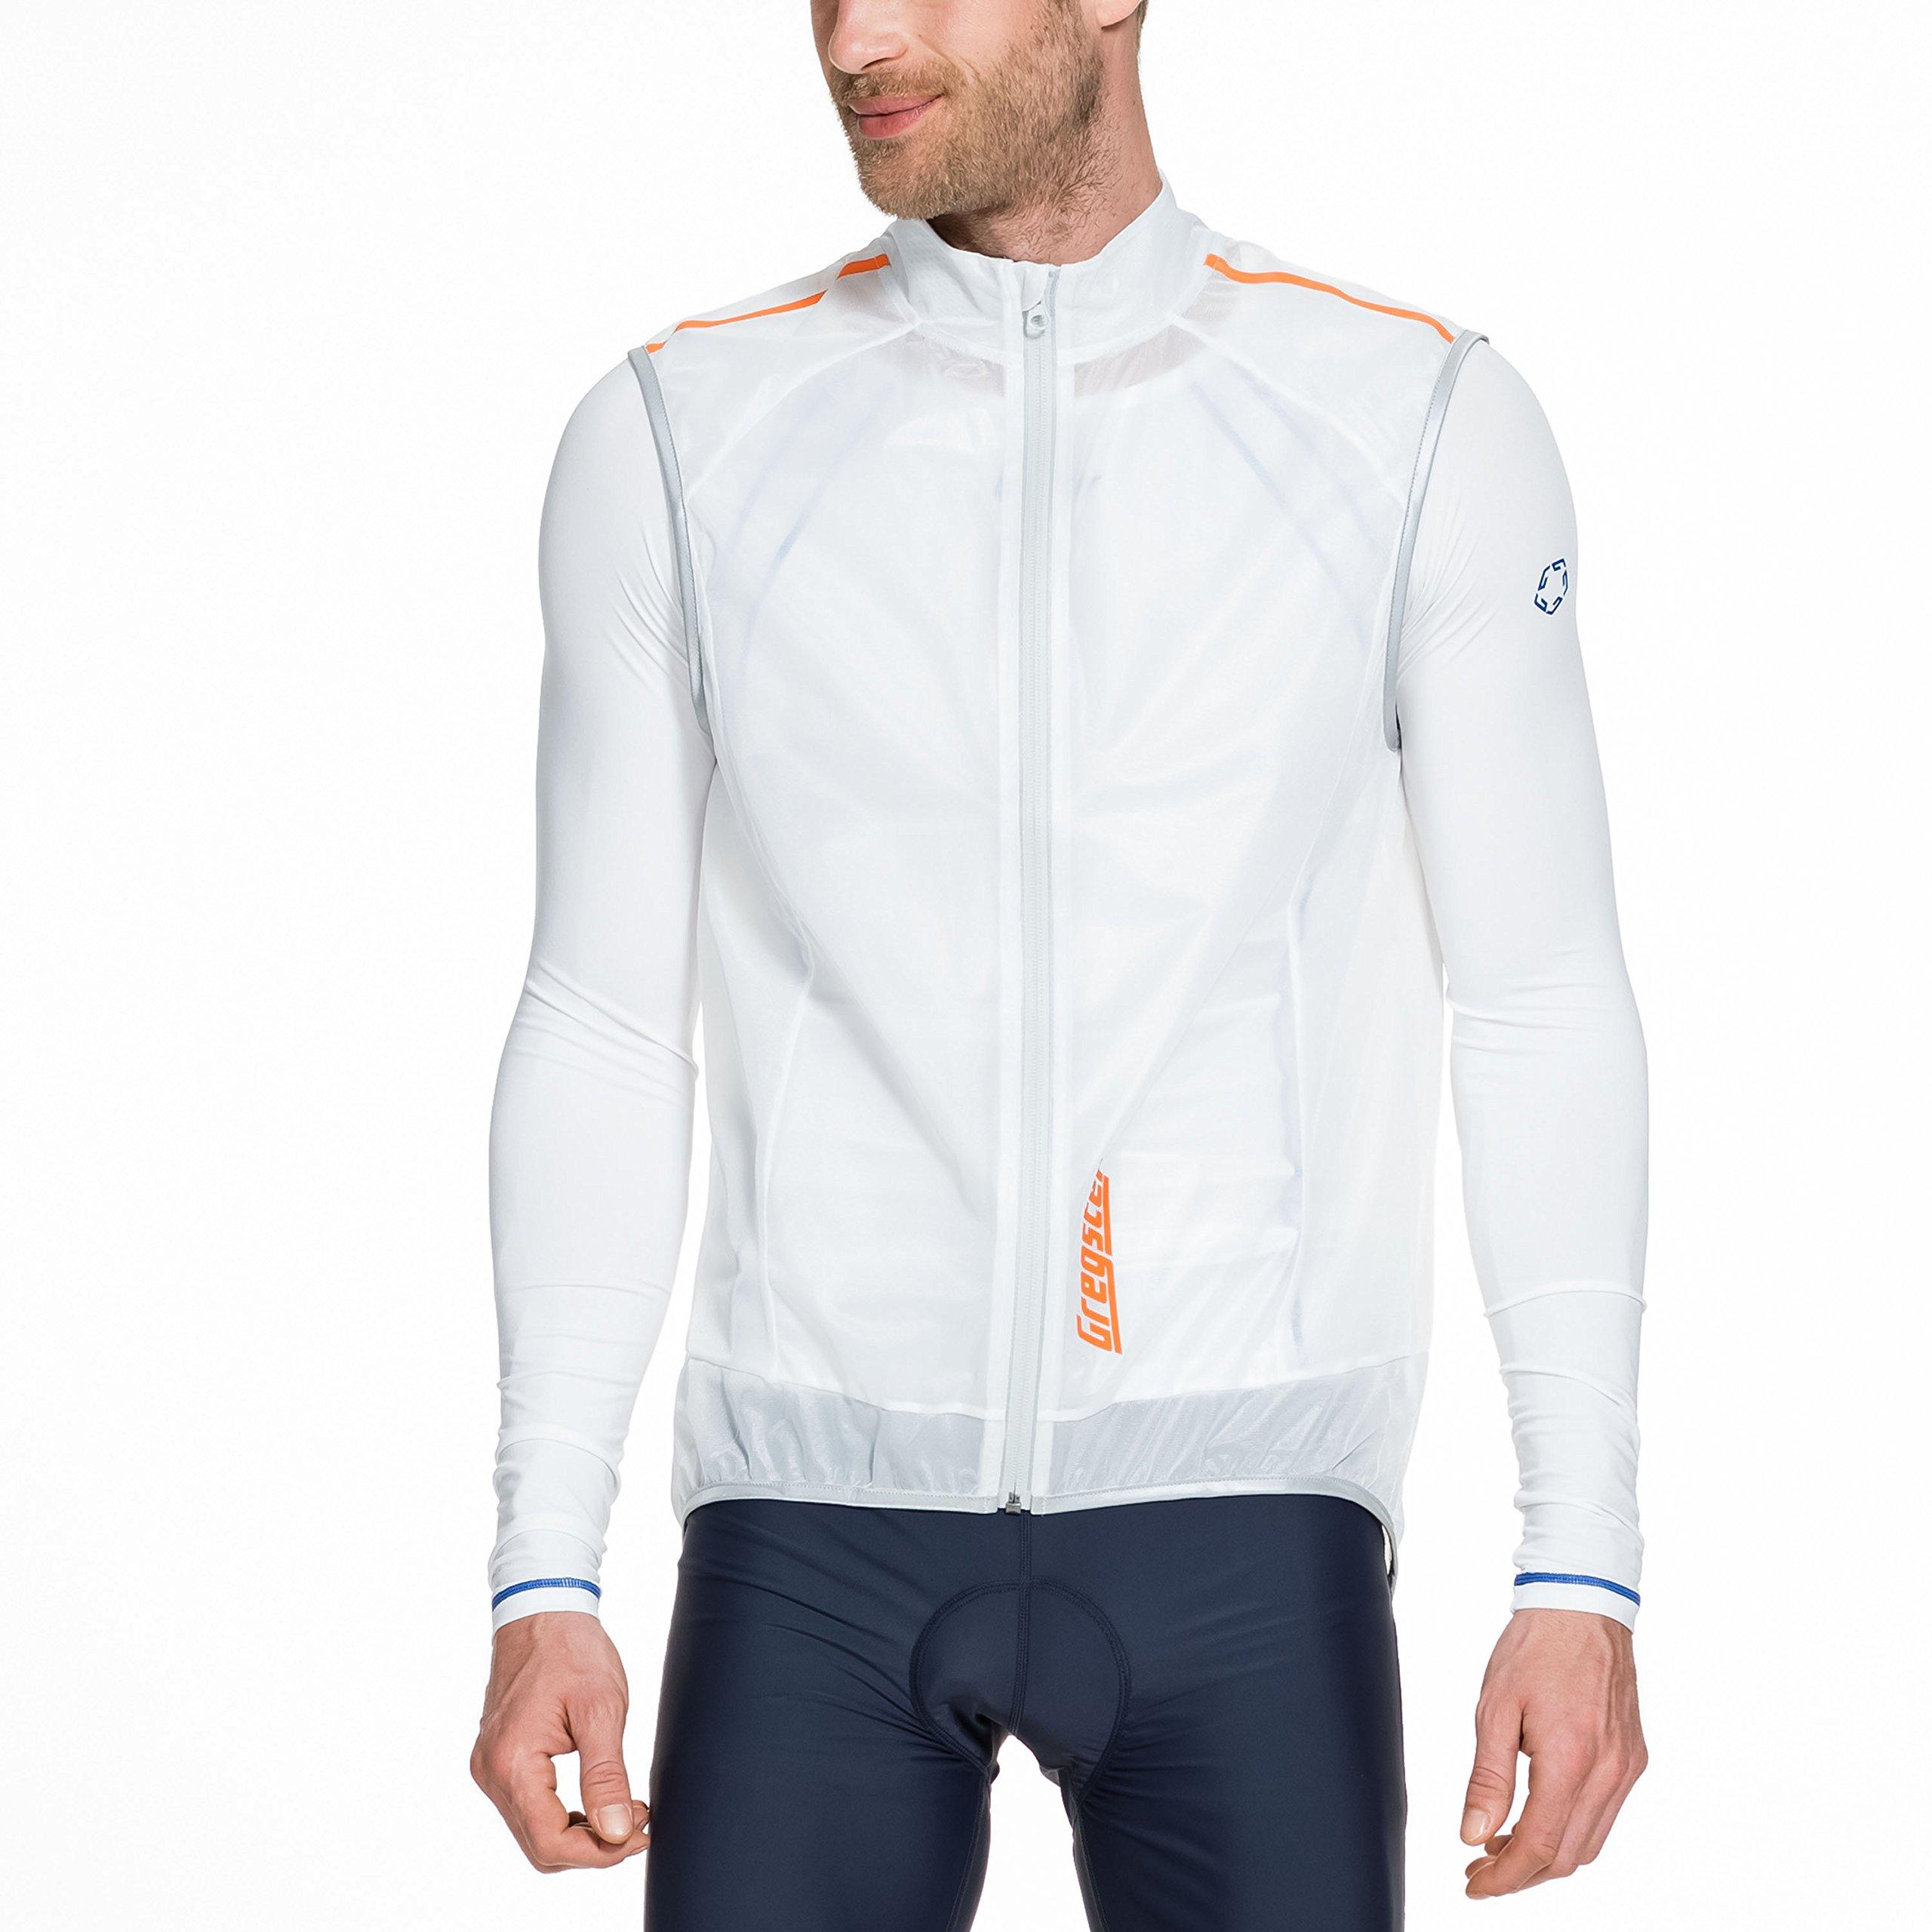 Gregster Herren Fahrradweste Bilge, Weiß, L, 12900